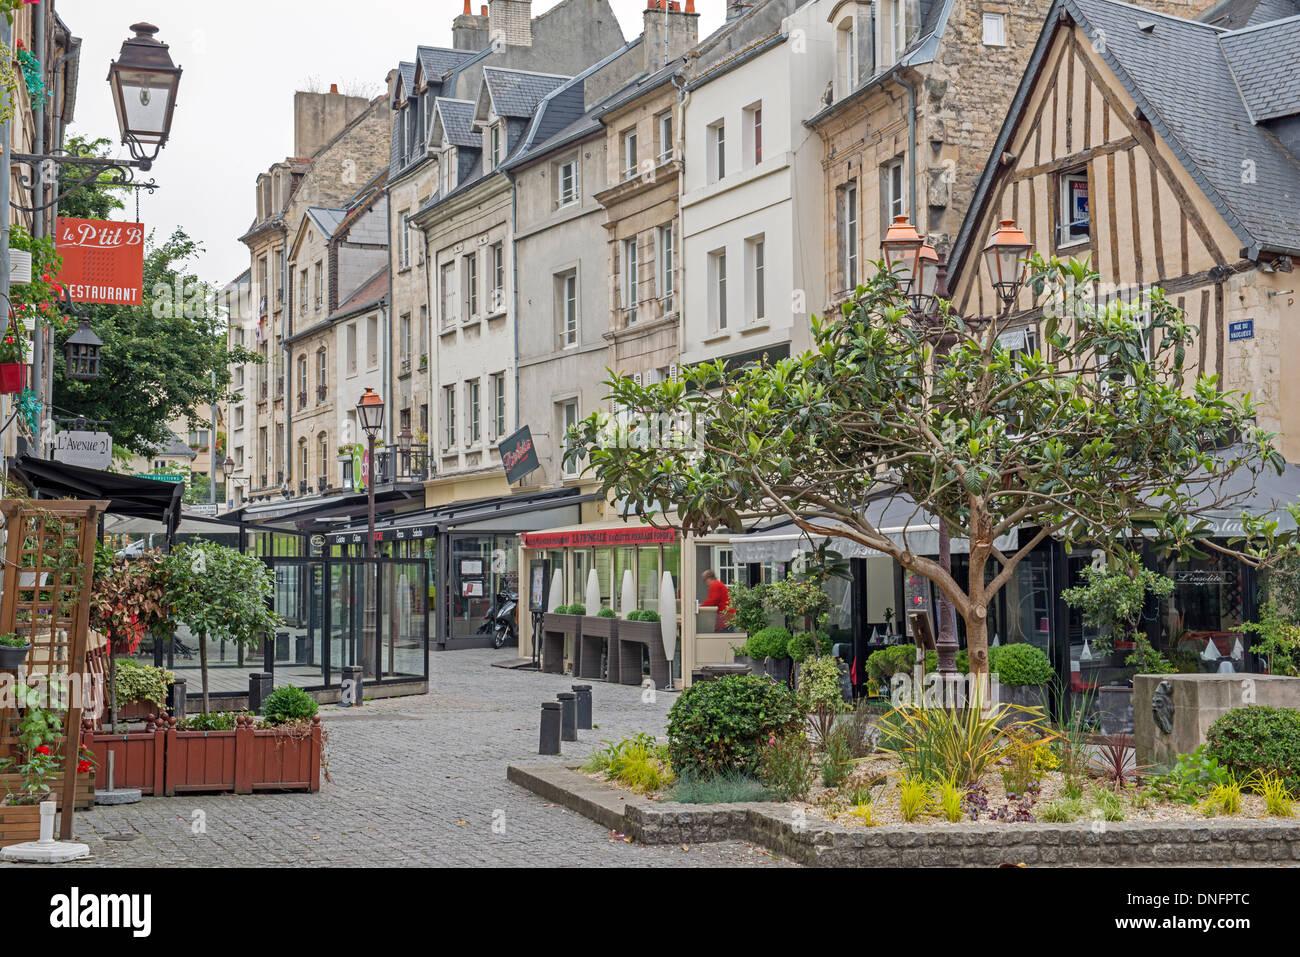 rue de vaugeaux in the old quarter of caen in the calvados 14 stock photo 64886092 alamy. Black Bedroom Furniture Sets. Home Design Ideas